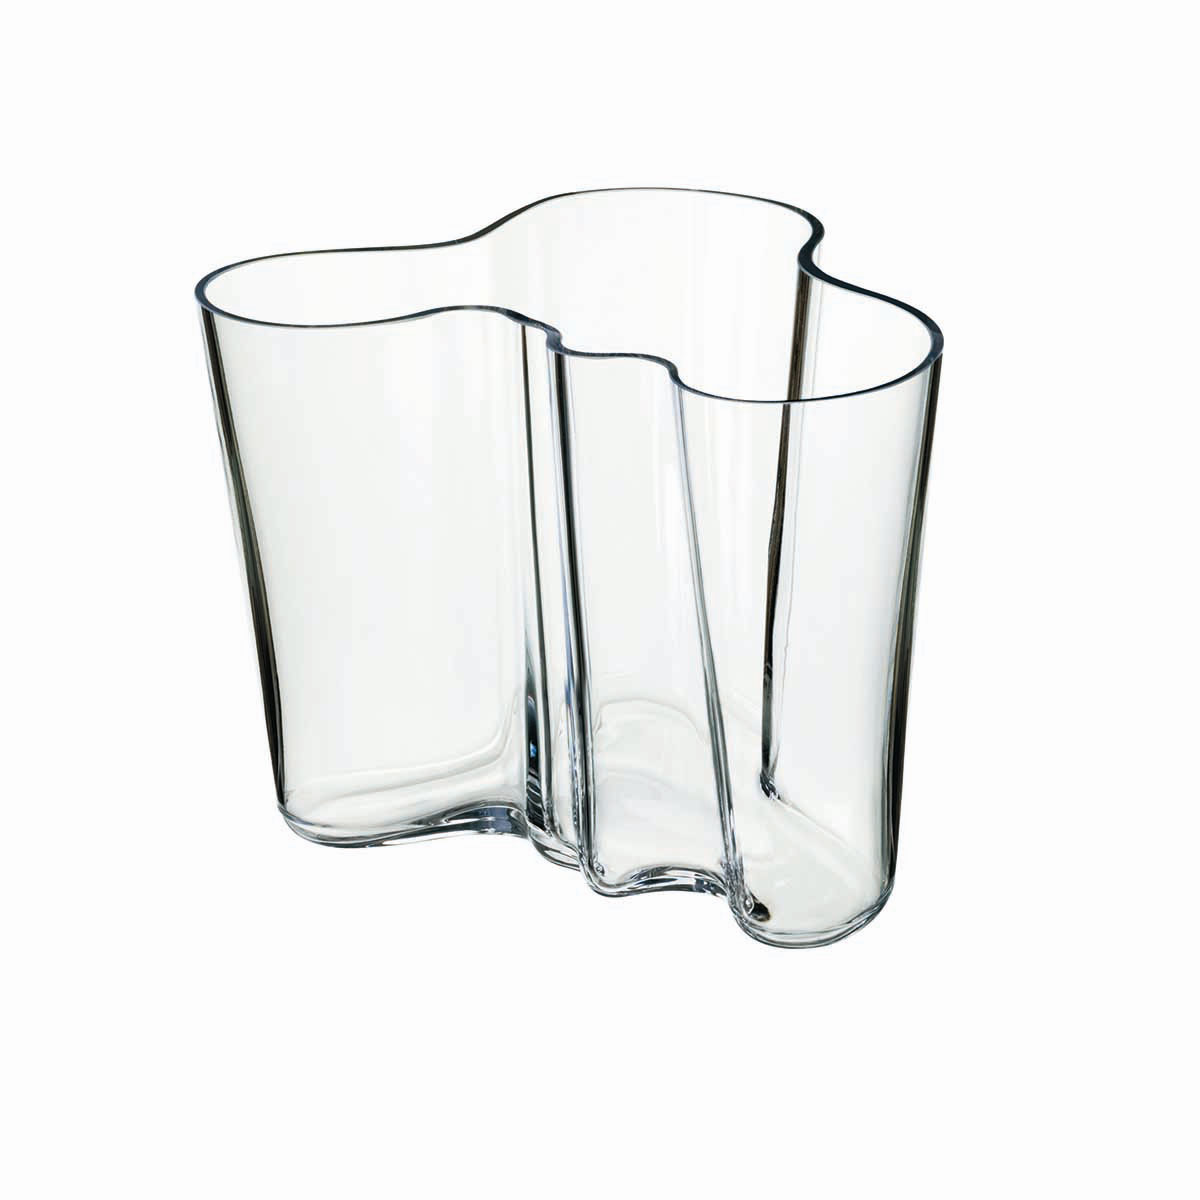 "Iittala Alvar Aalto 6 1/4"" Vase, Clear"